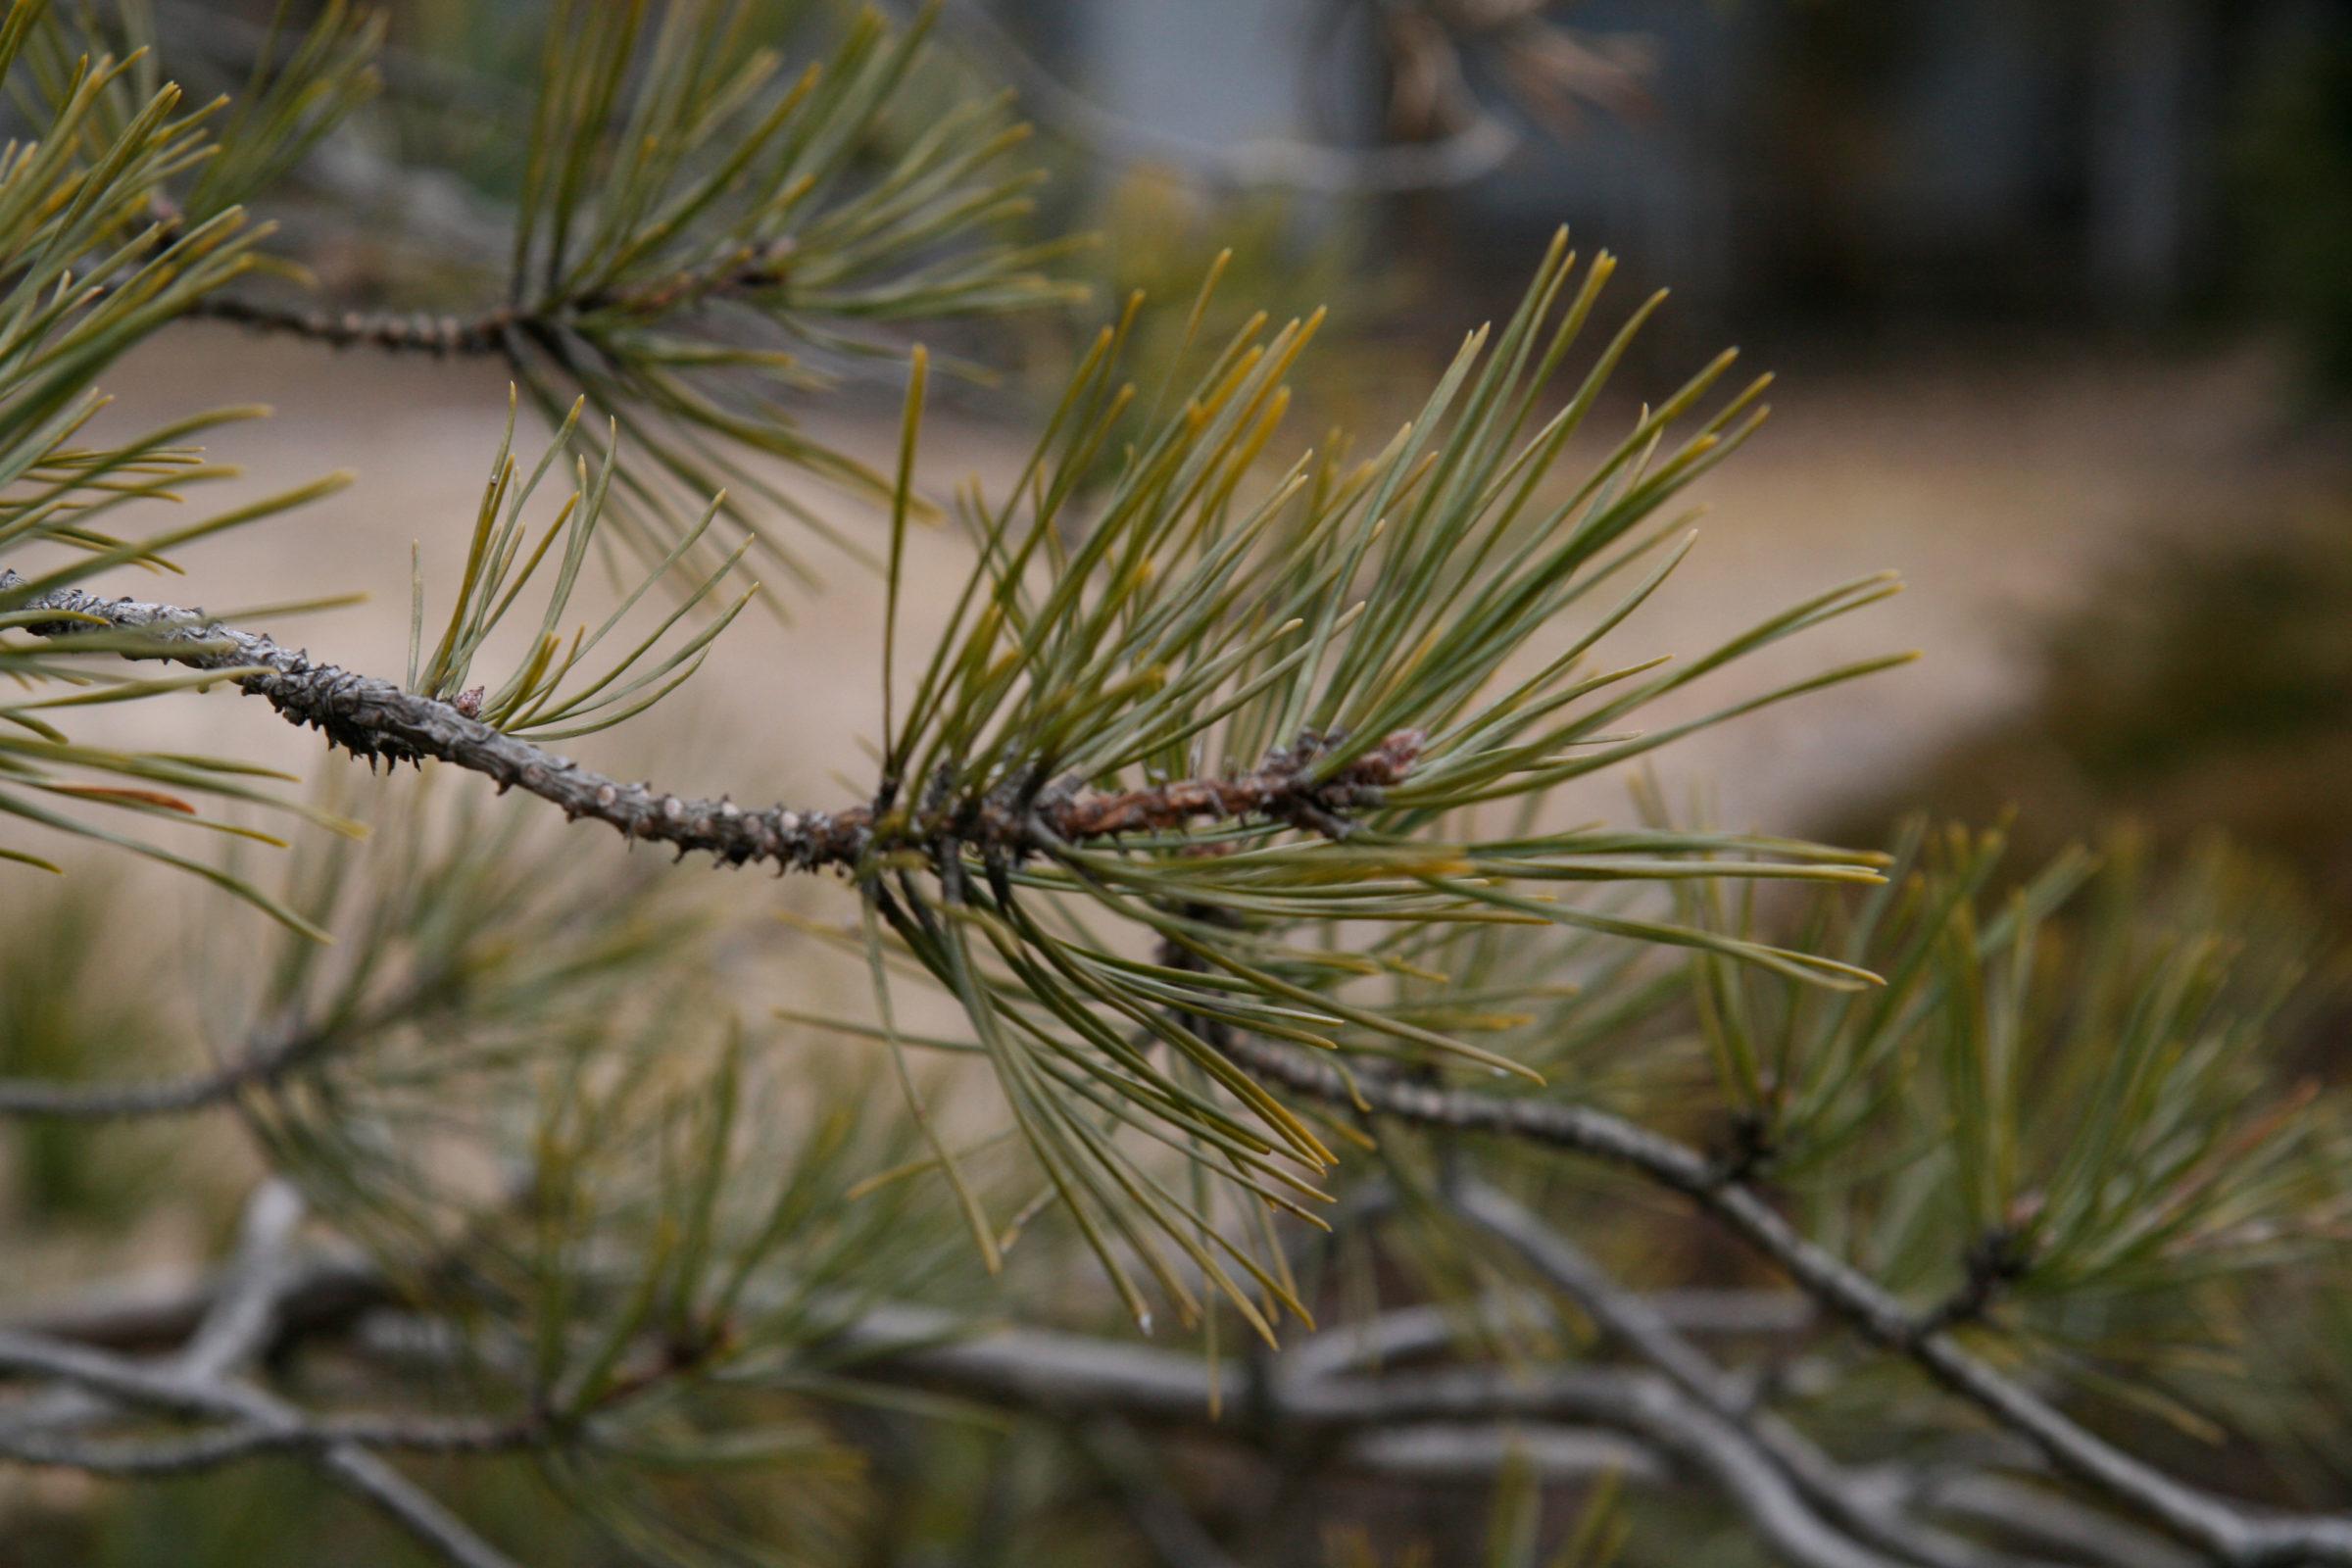 Pitch Pine Needles